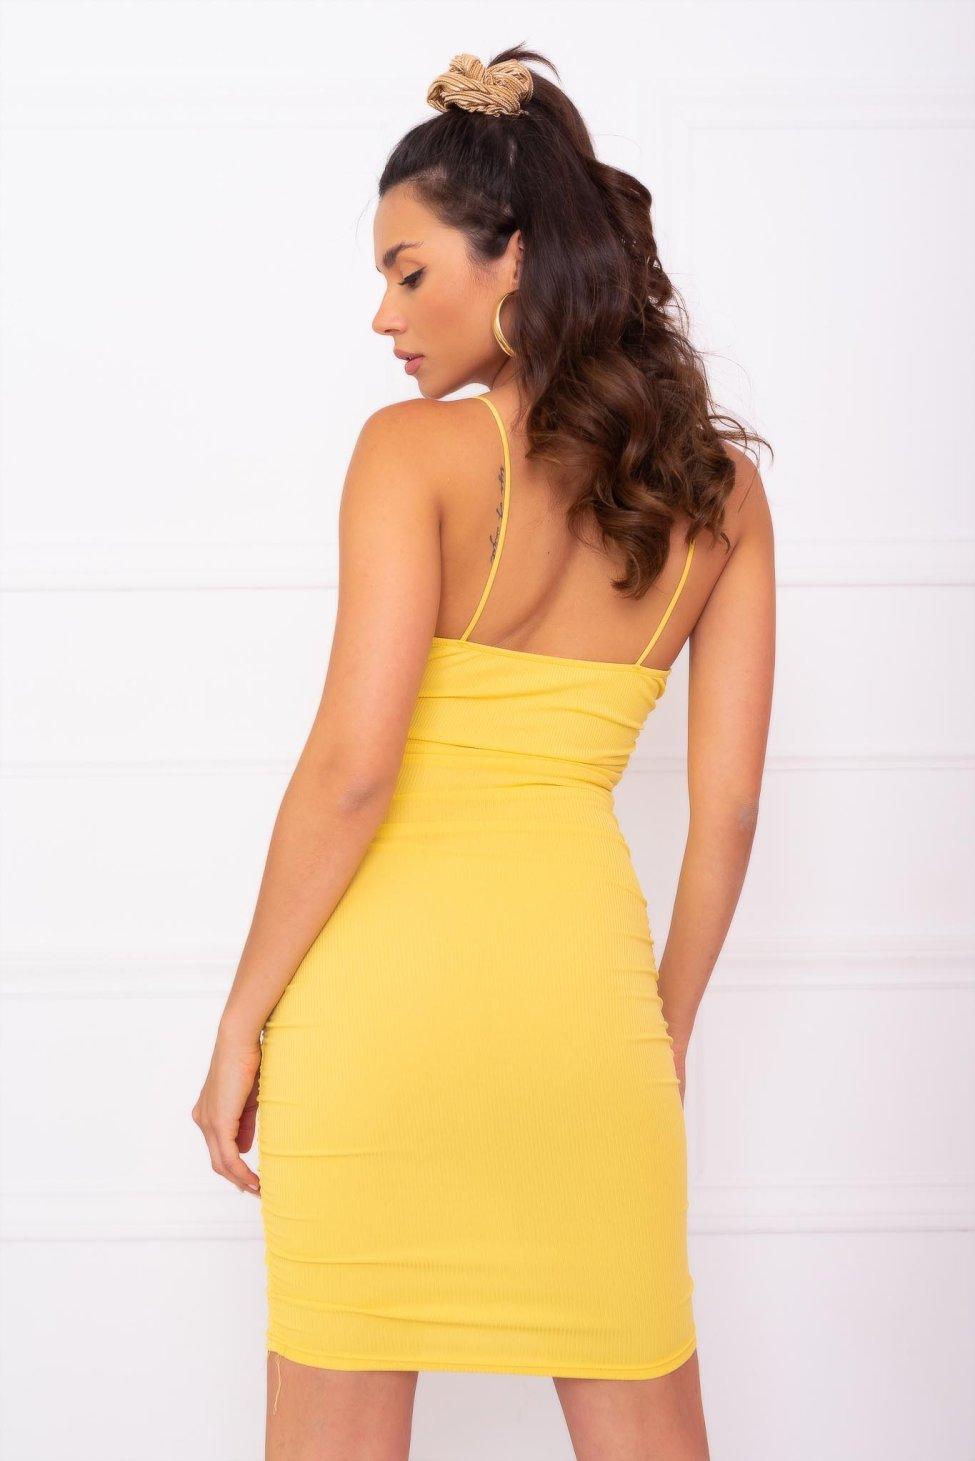 Armor ριπ φόρεμα κίτρινο